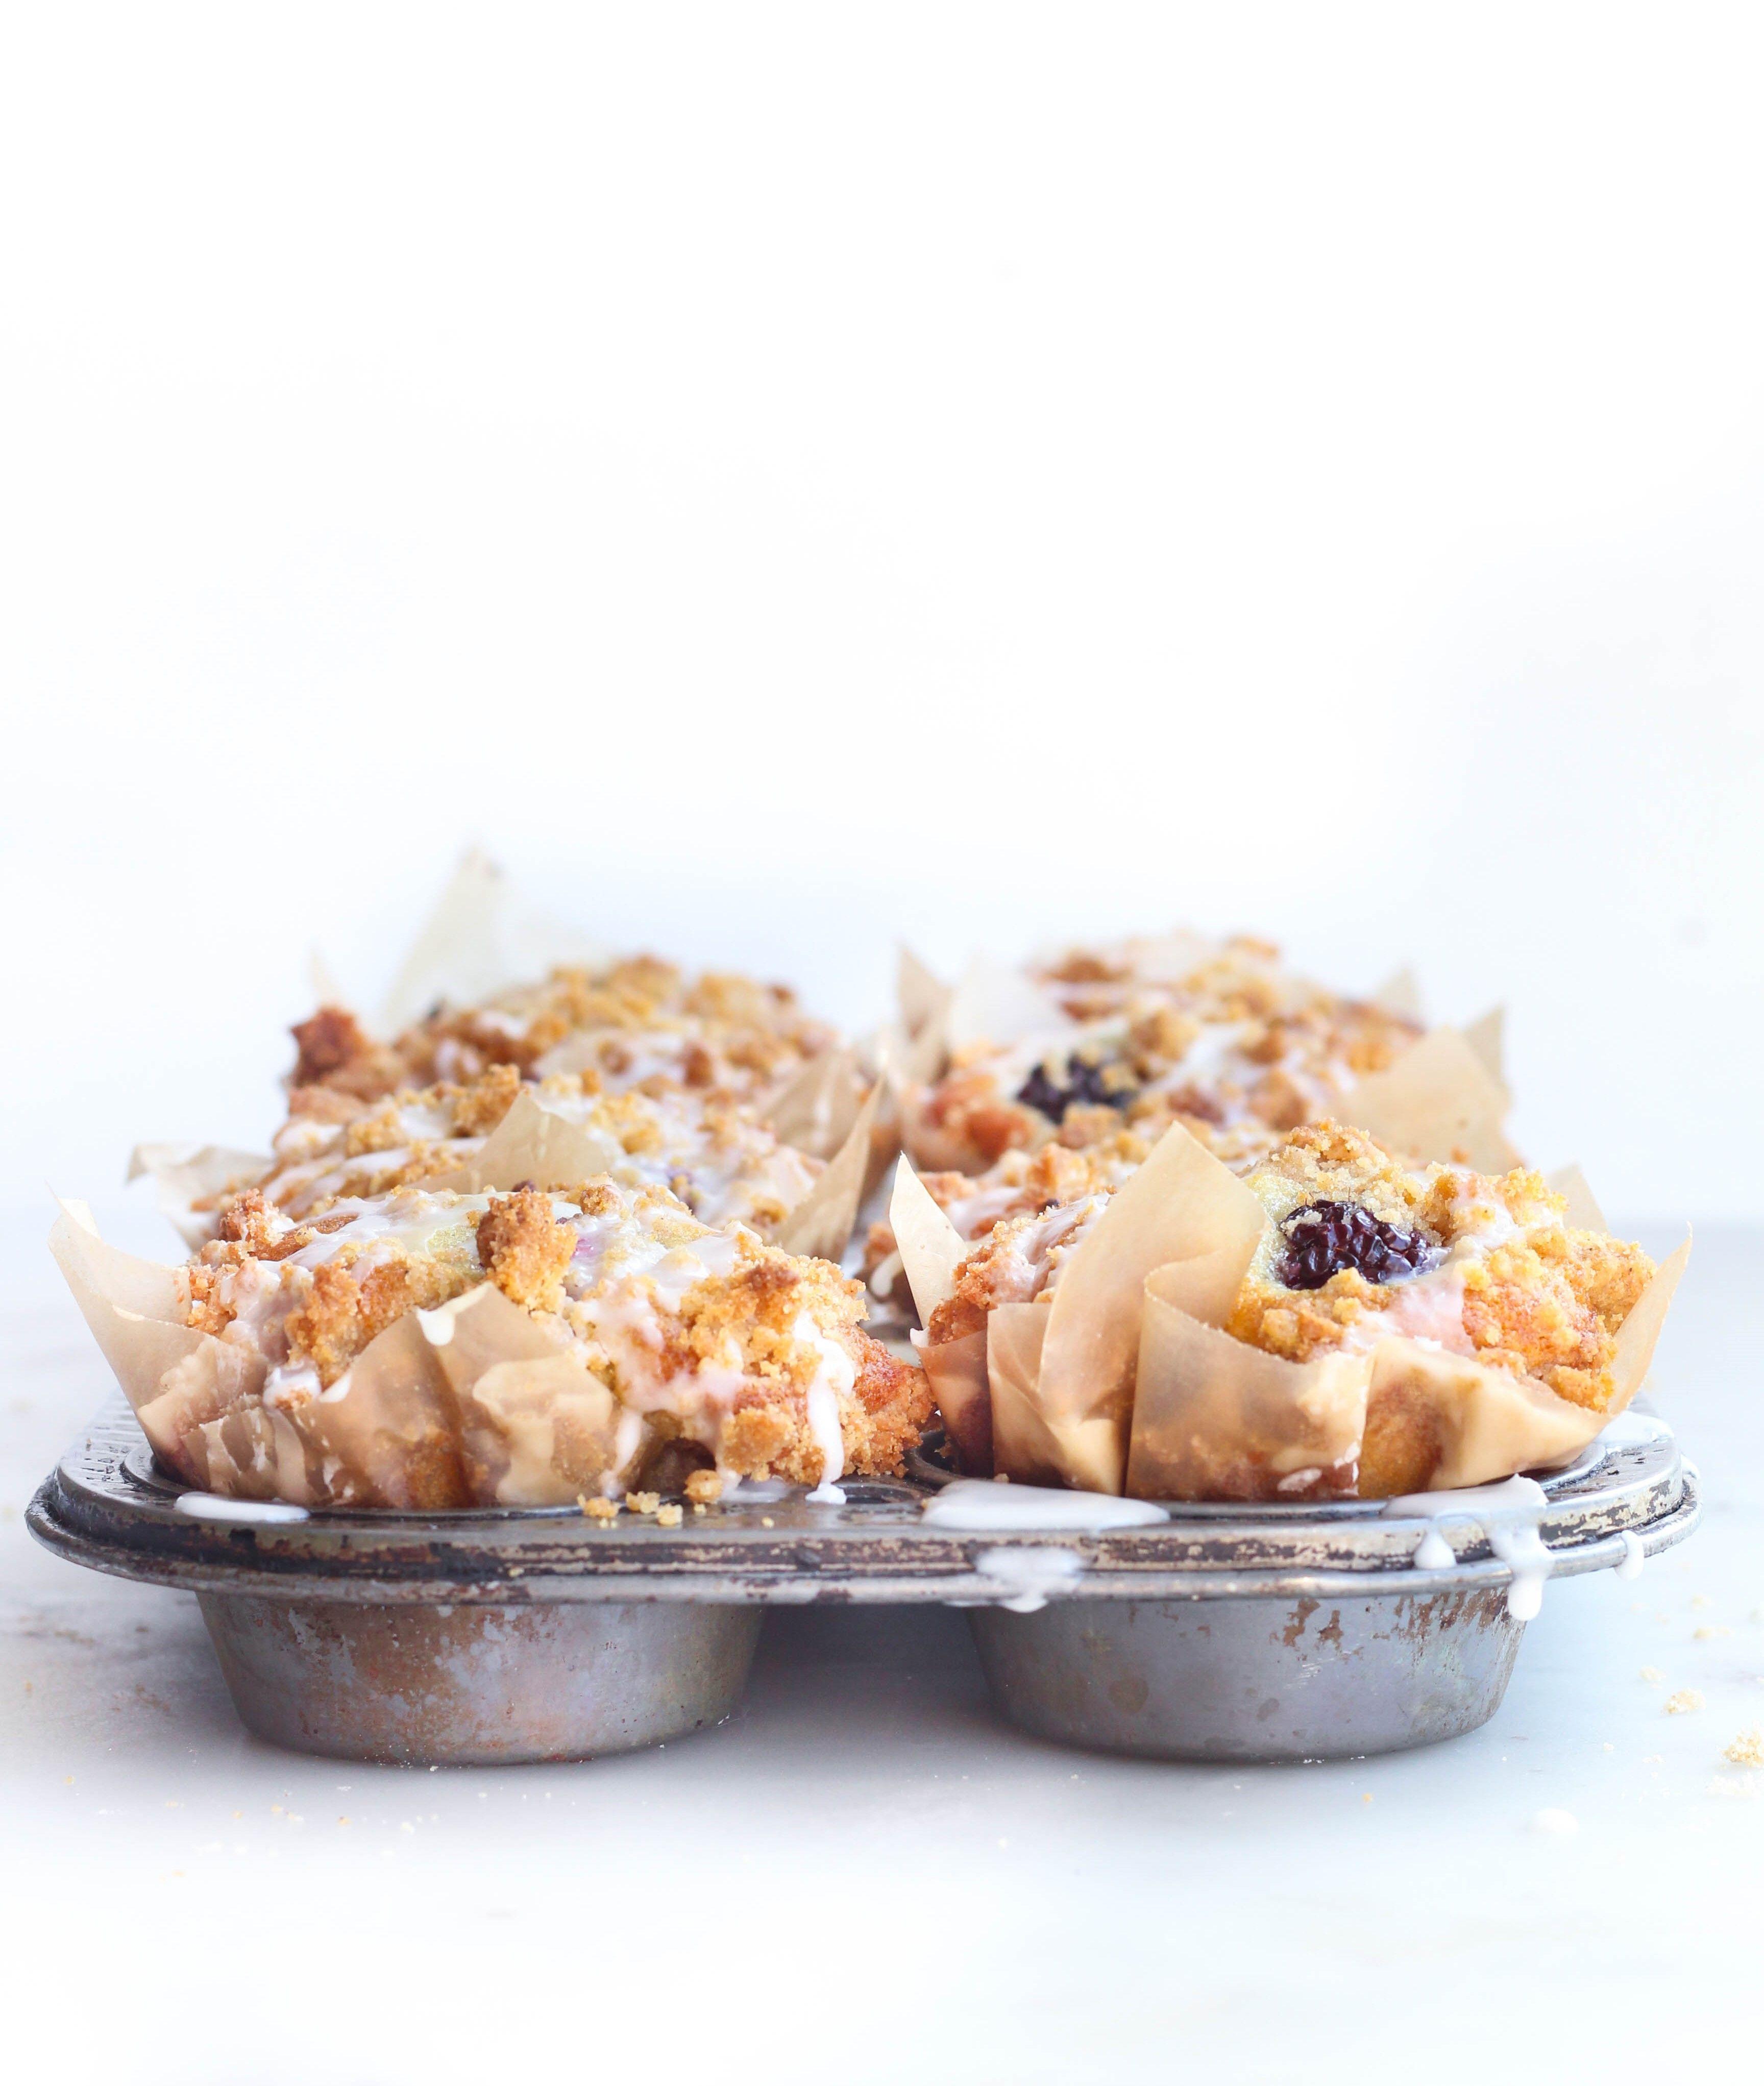 Blackberry greek yogurt crumb muffins with images